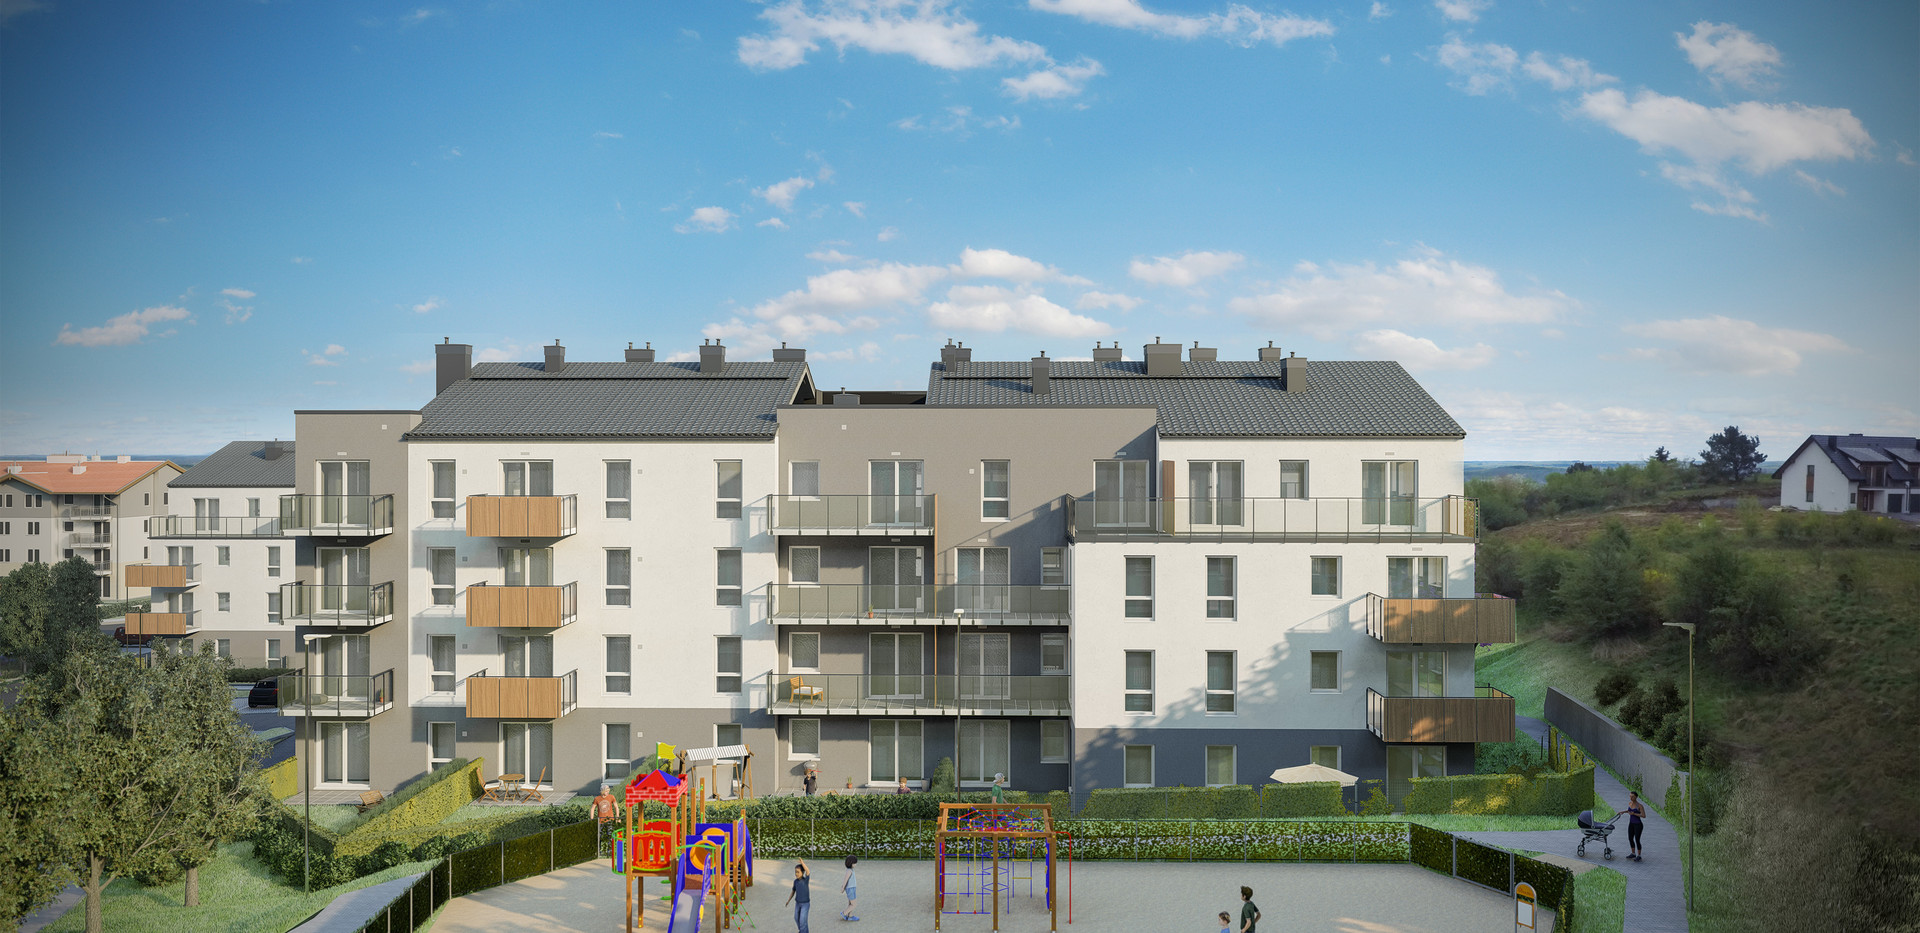 Nowe mieszkania Gdańsk Borkowo